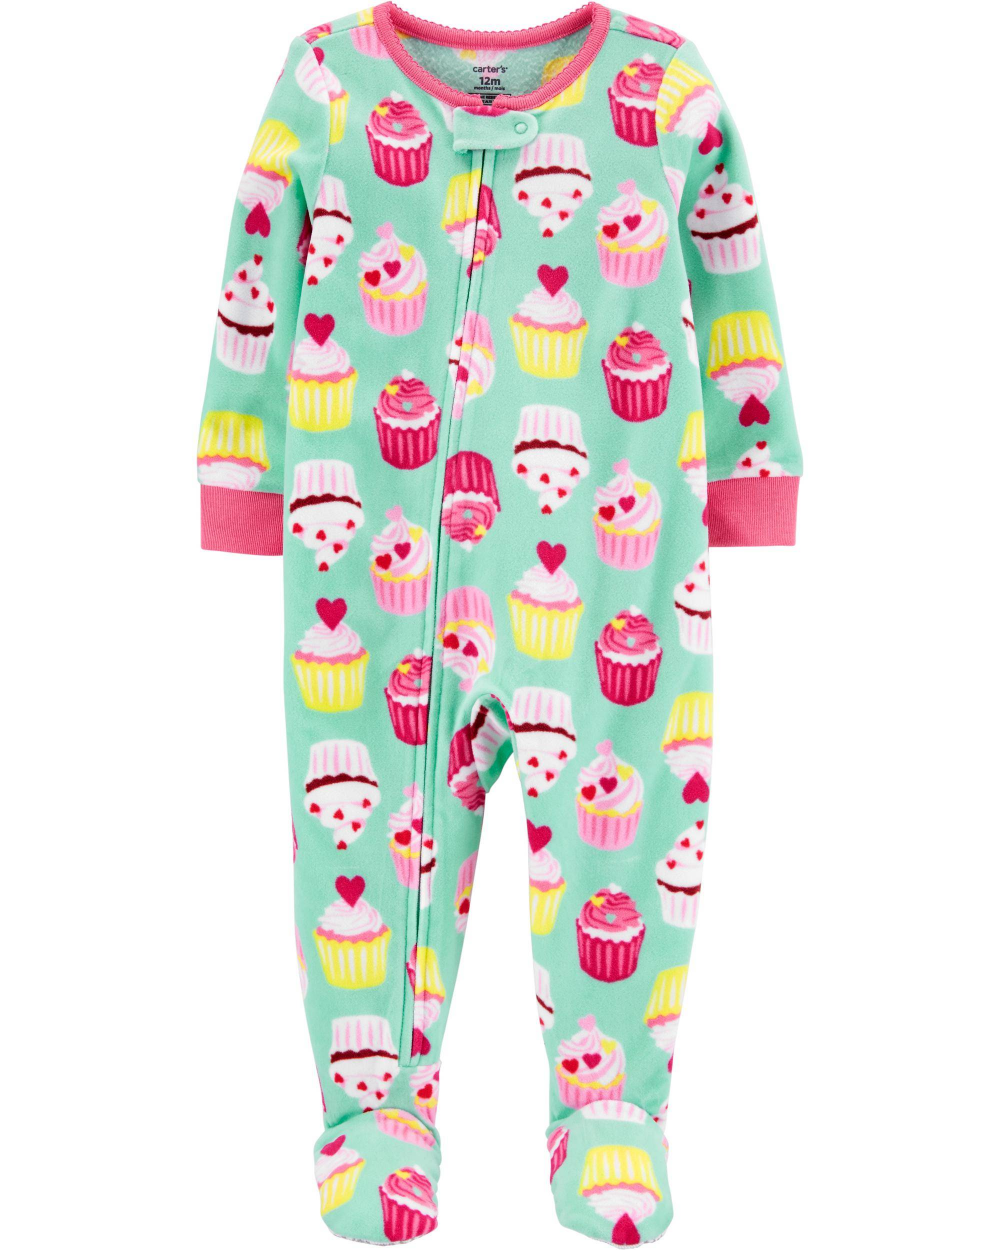 Carter/'s Toddler Girls  Size 24 Months  Sleeper Pajamas    Fairy Princess